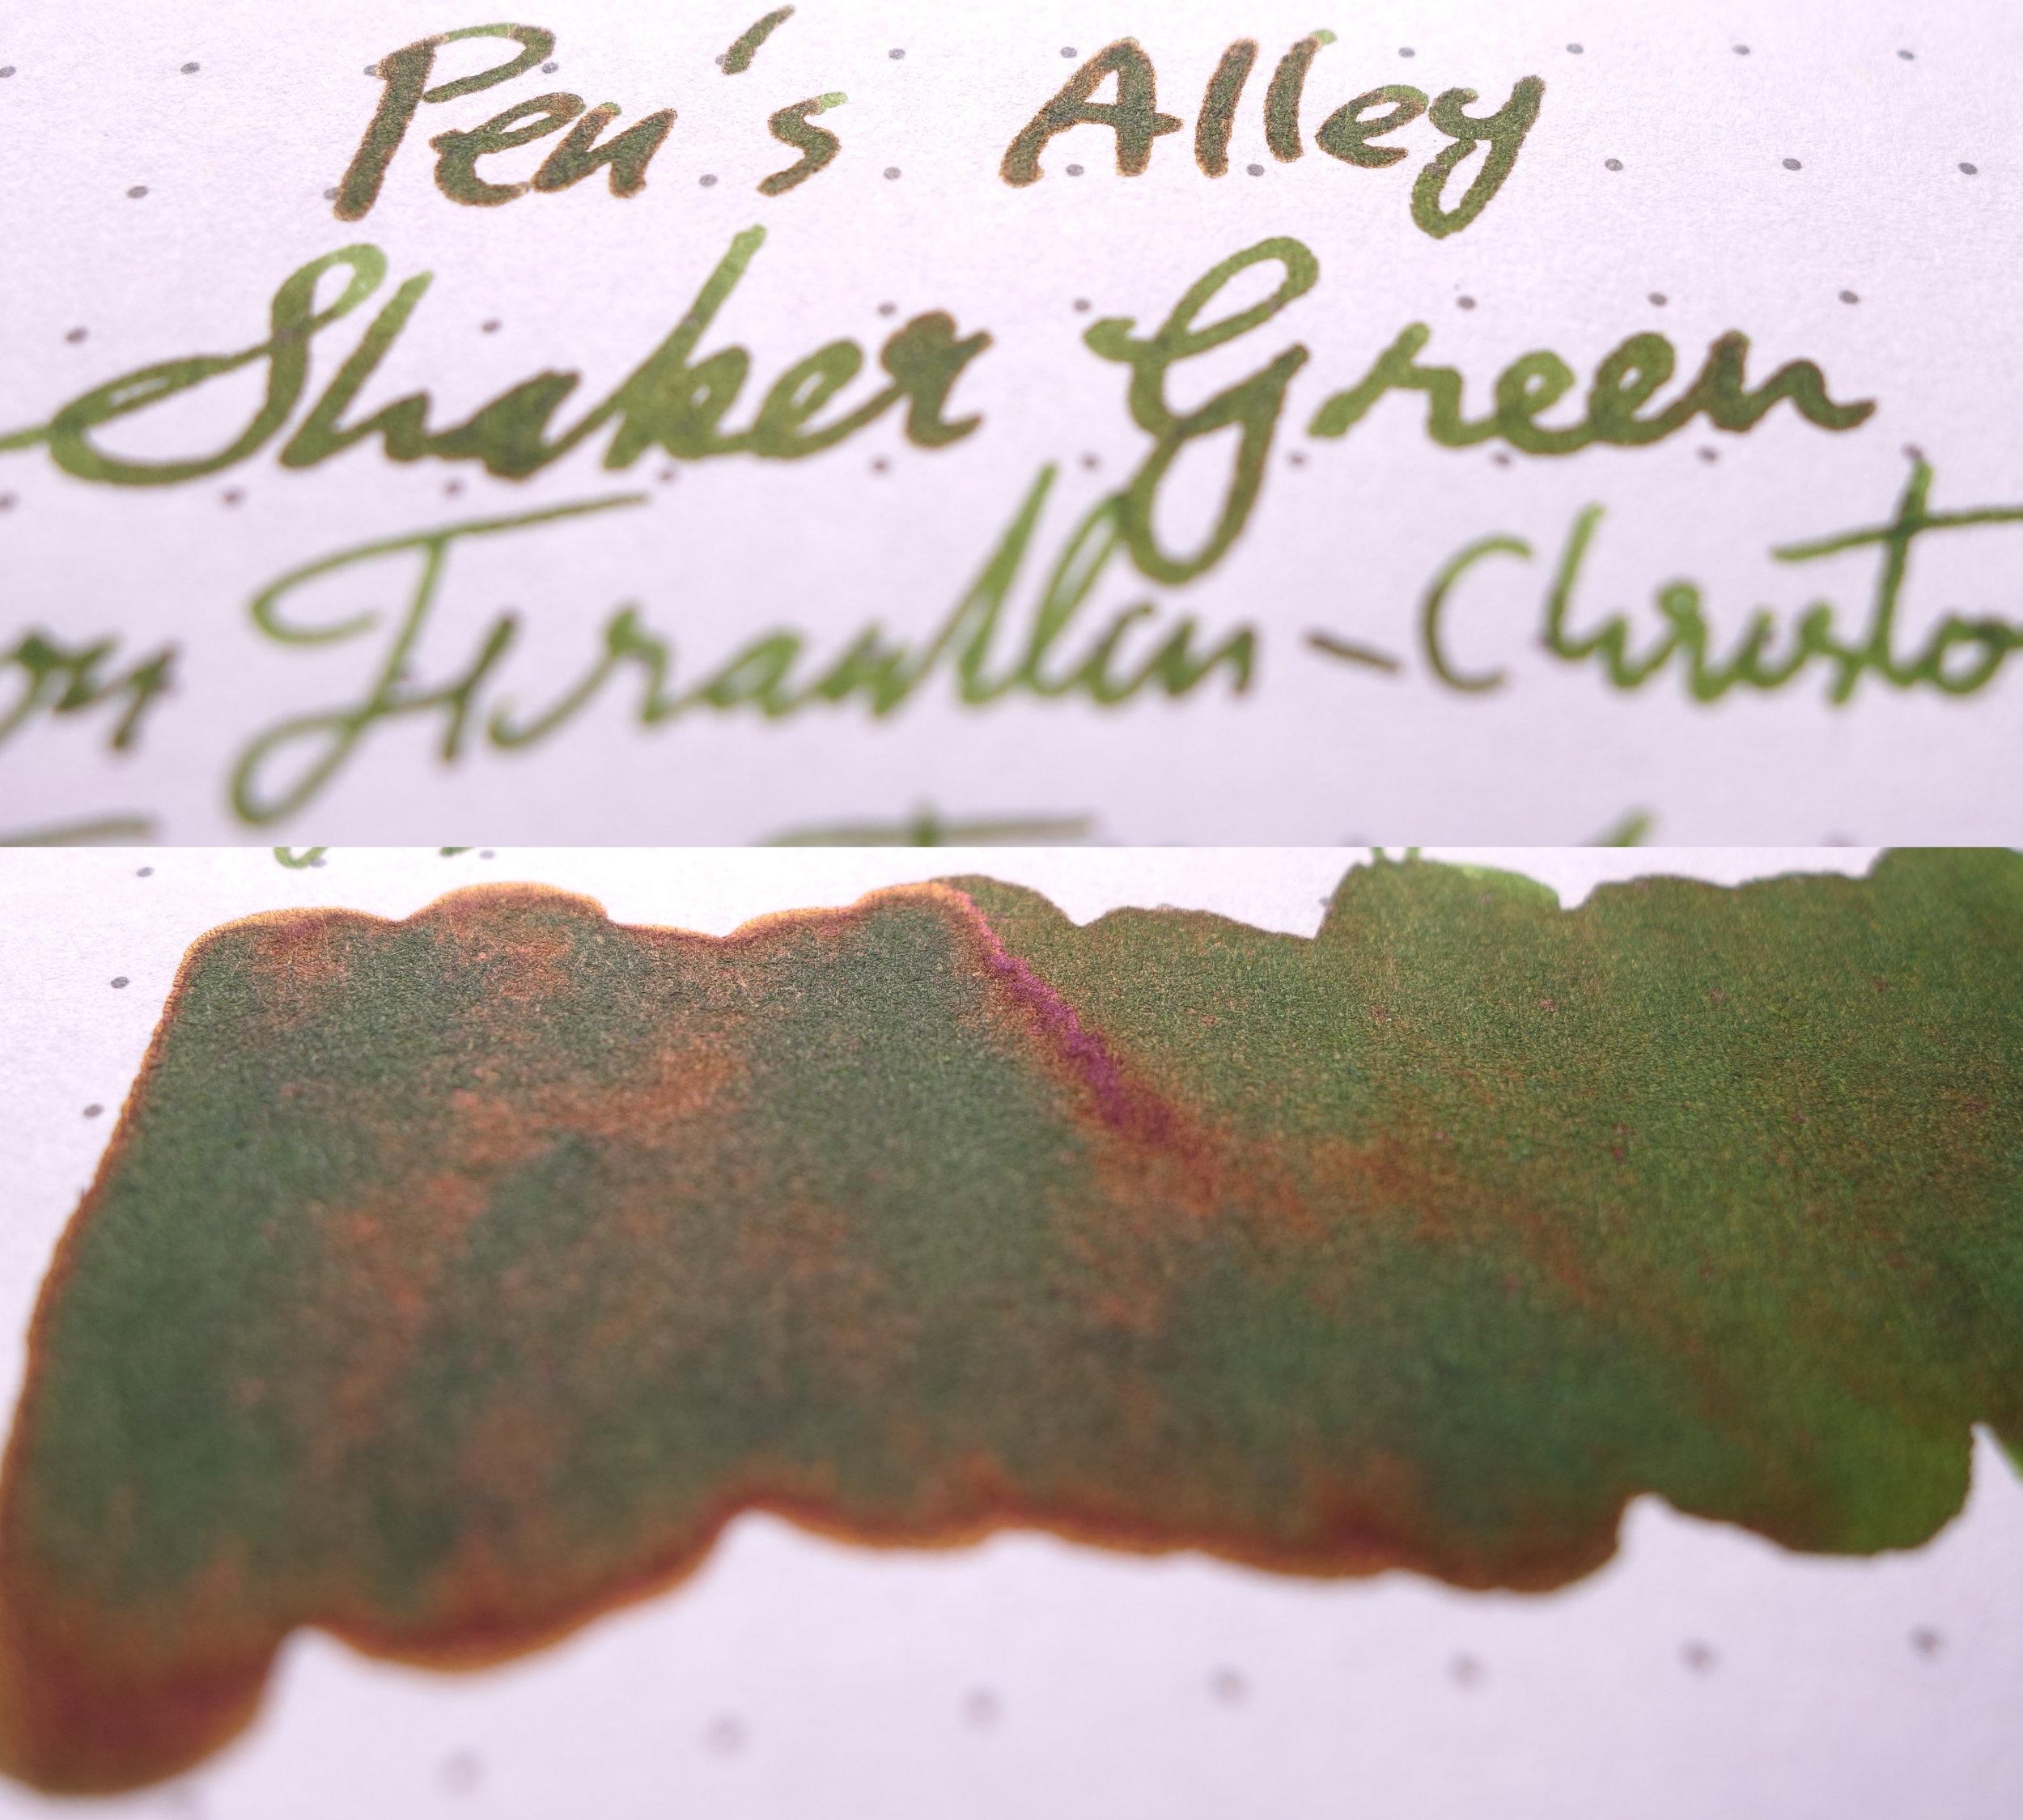 Sheen Franklin-Christoph